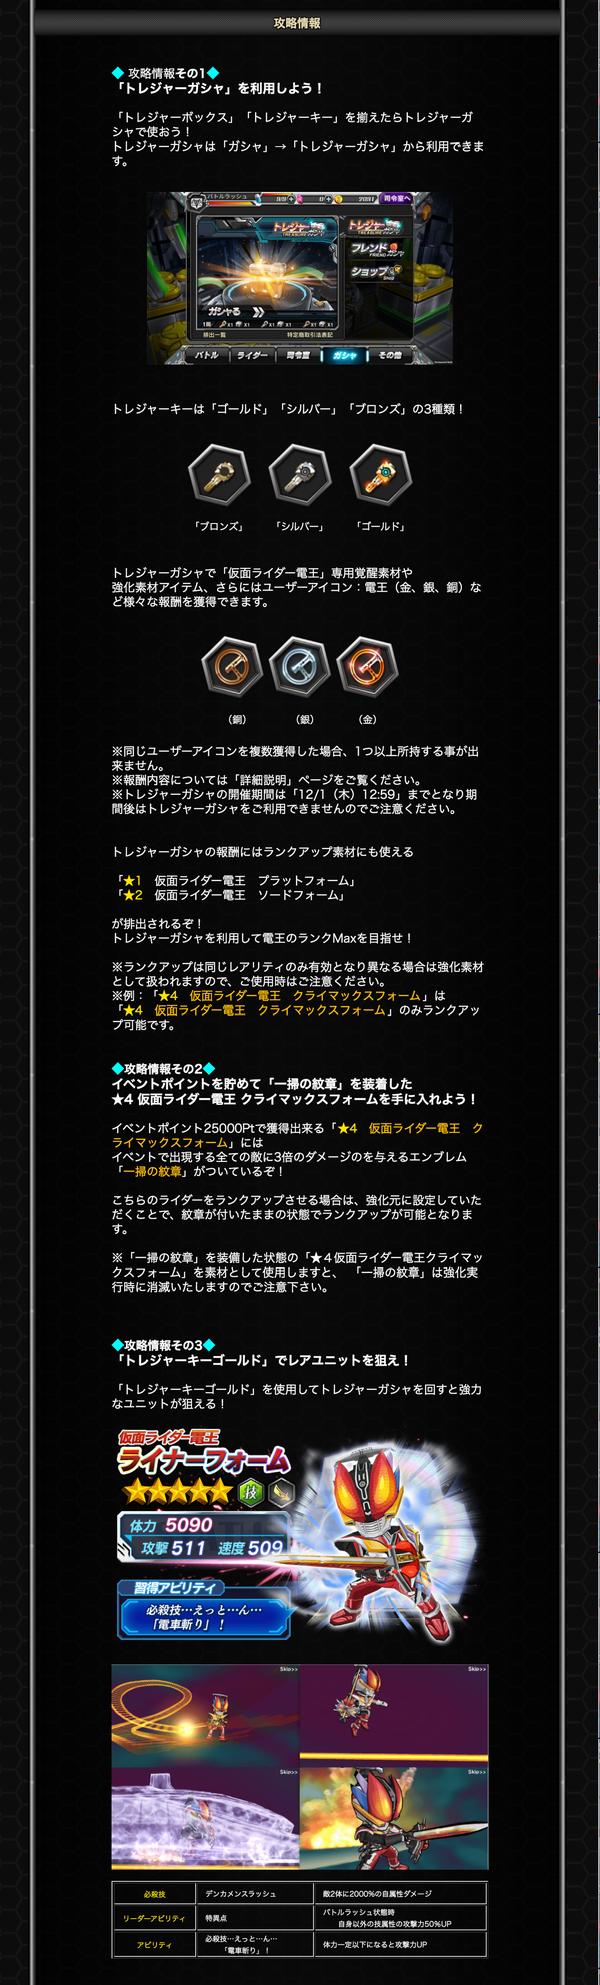 f:id:ich-ichi:20161112014131p:plain